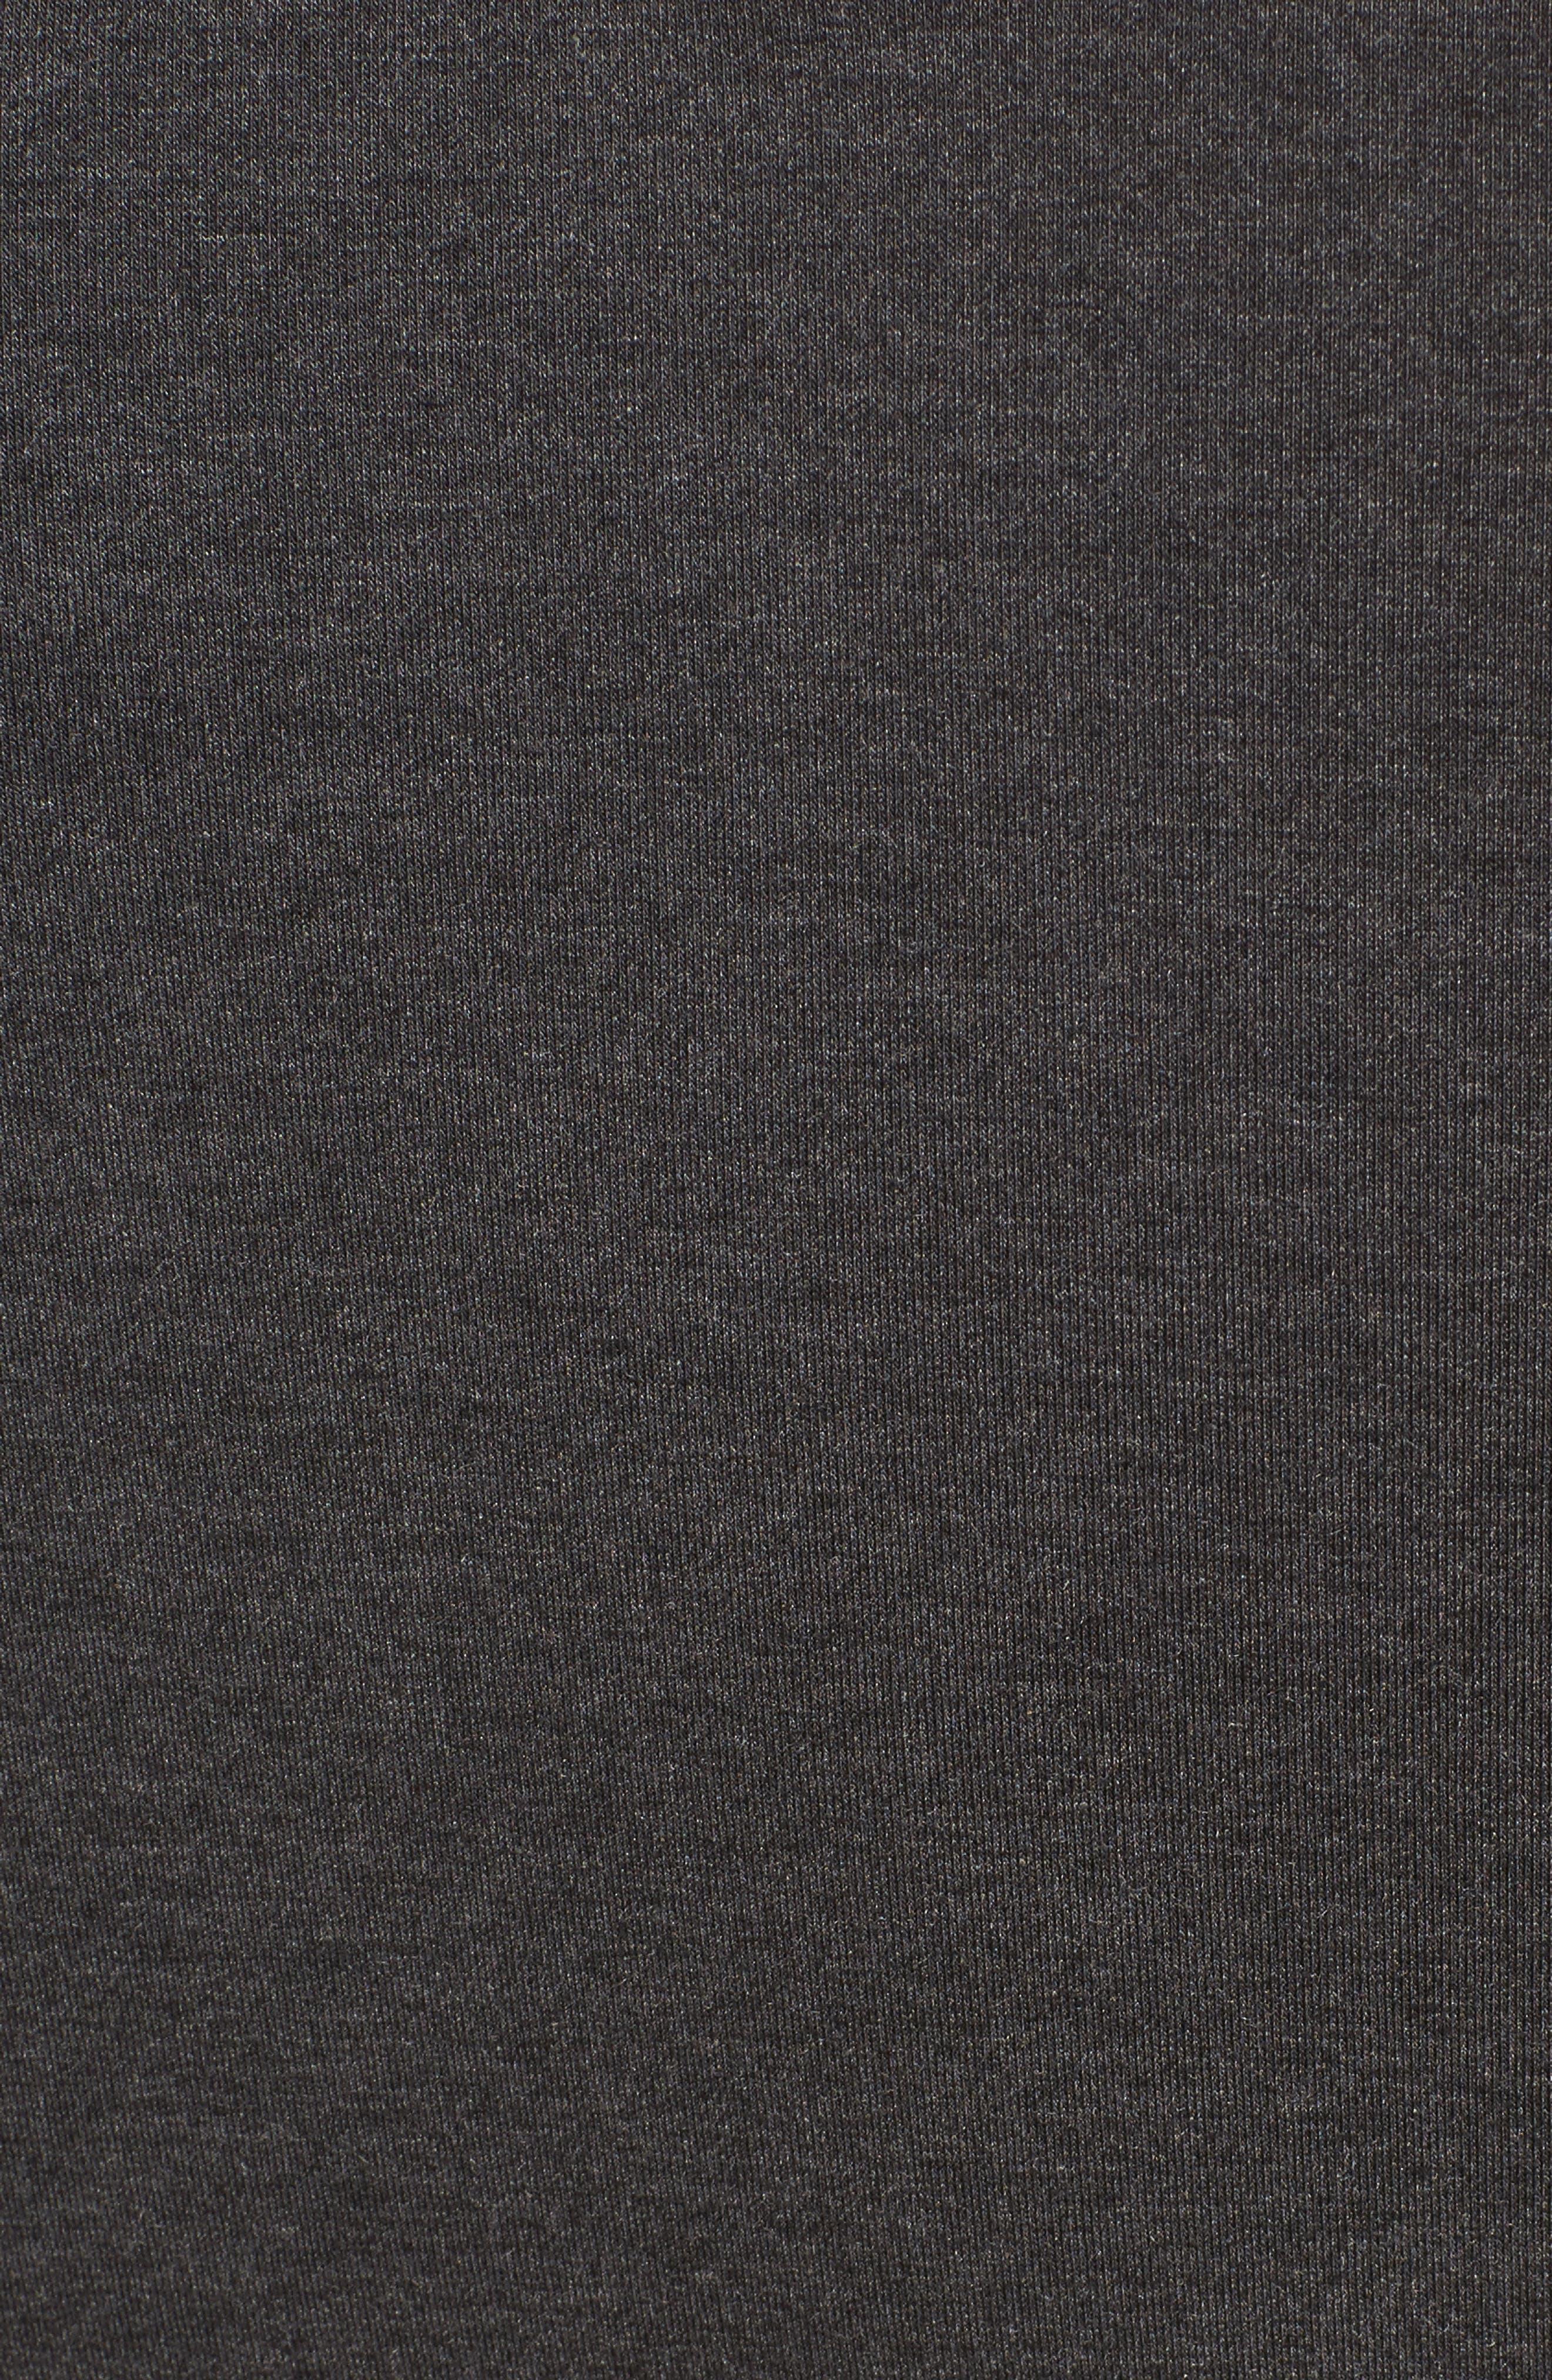 Ruffle Cold Shoulder Top,                             Alternate thumbnail 5, color,                             421